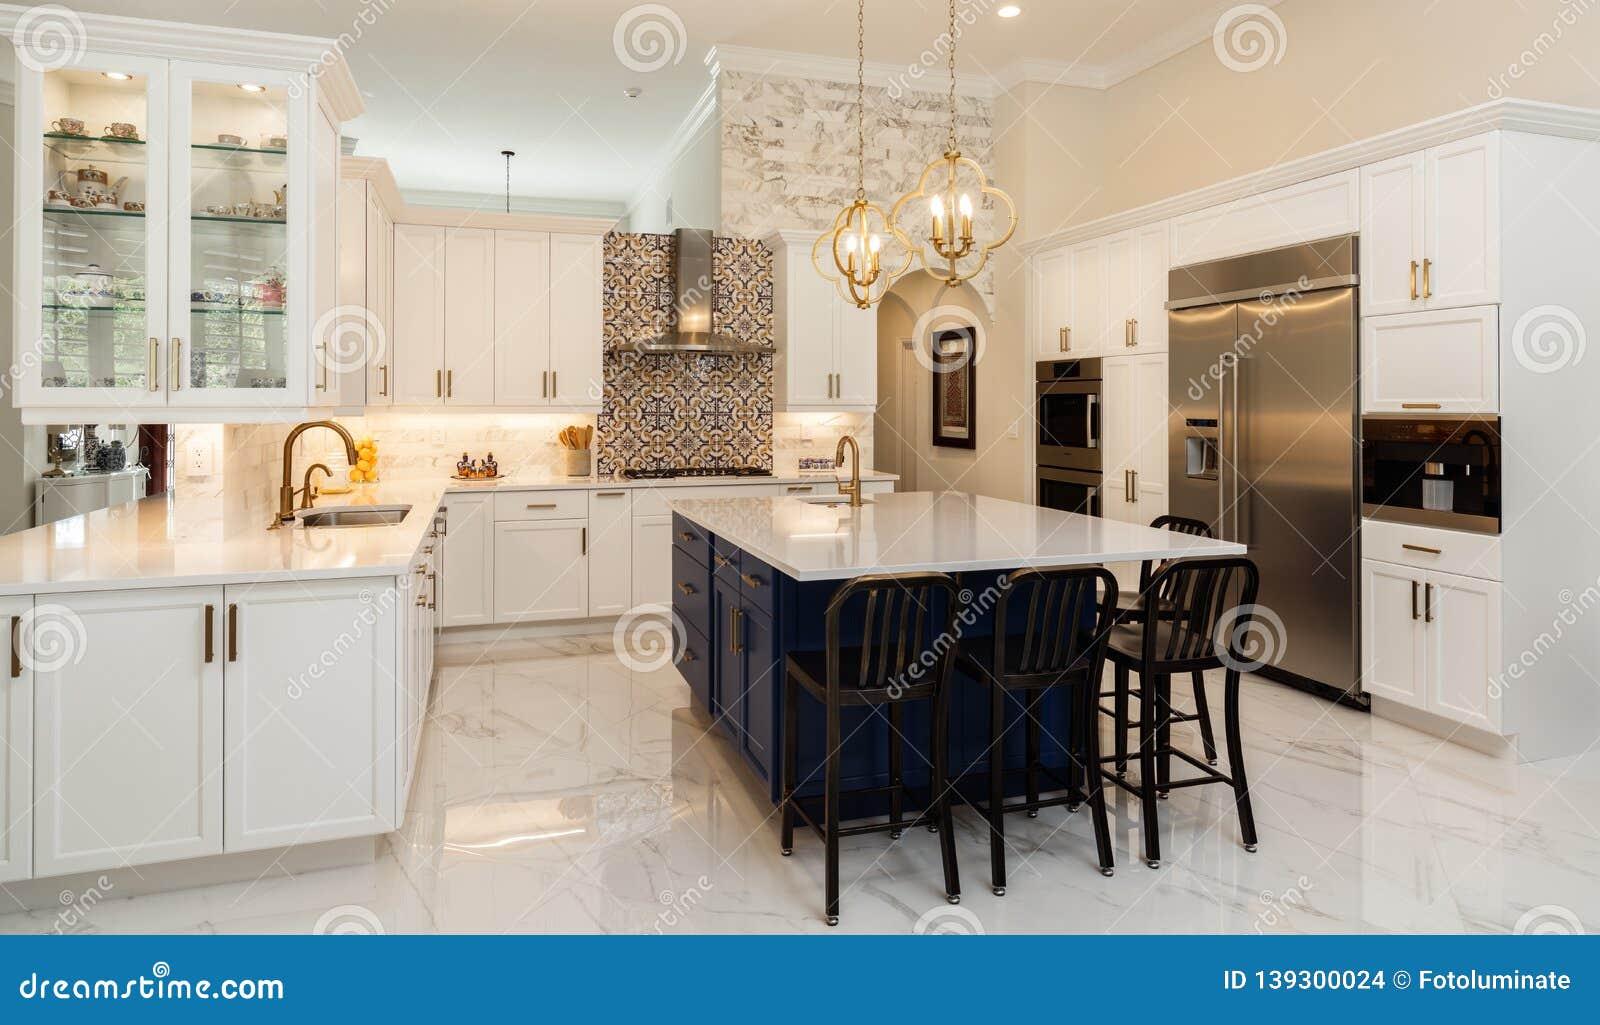 Luxury White Kitchen Home Design Stock Photo Image Of Granite Home 139300024